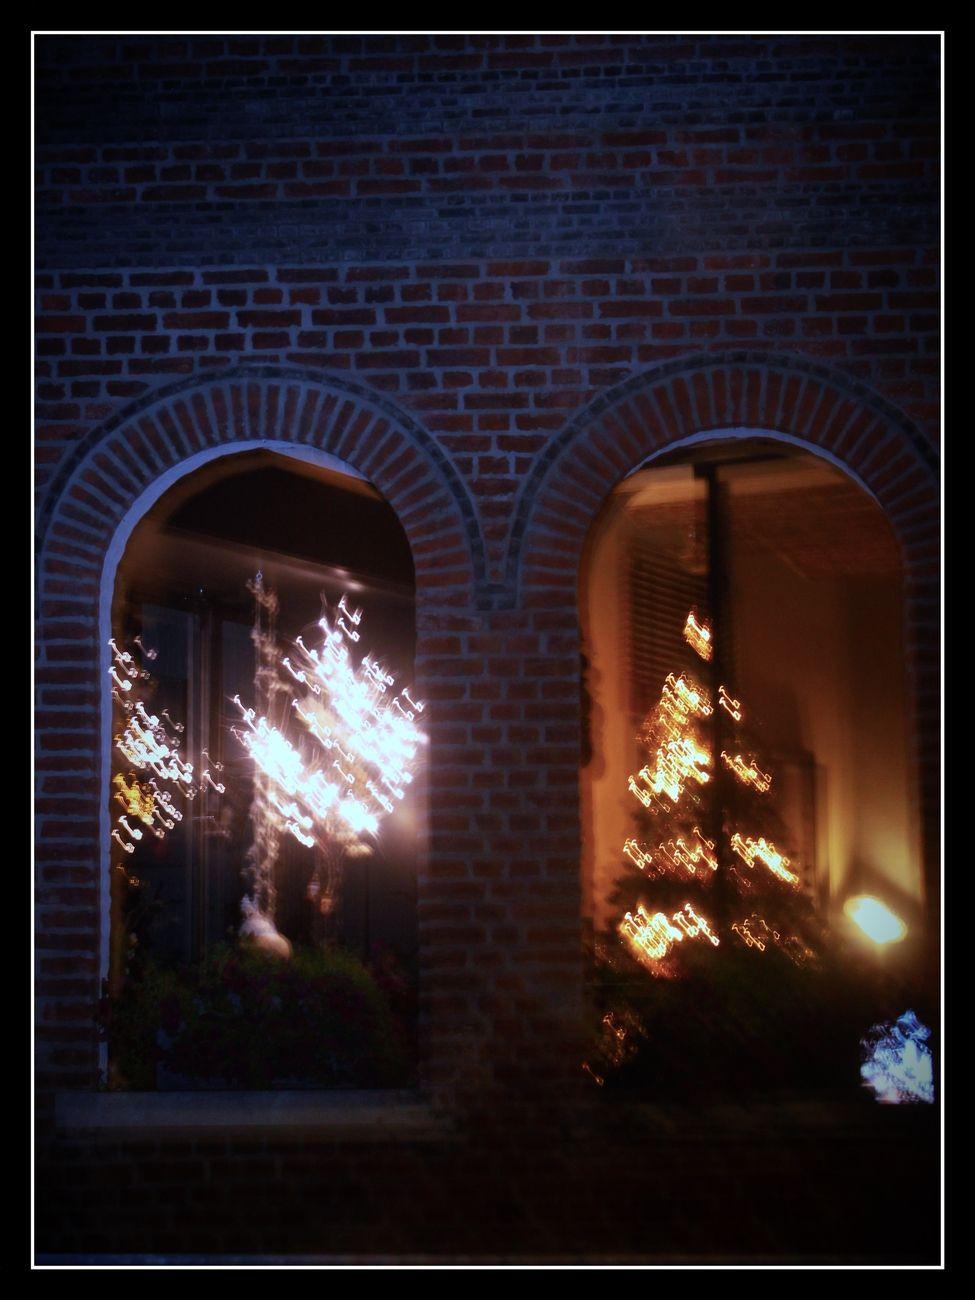 Christmas in Tienen Belgium. Despite Covid19, Tienen tries To bring Christmas into a pleasant atmosphere. Theo-Herbots-Photography https://groetenuittienen.blog/